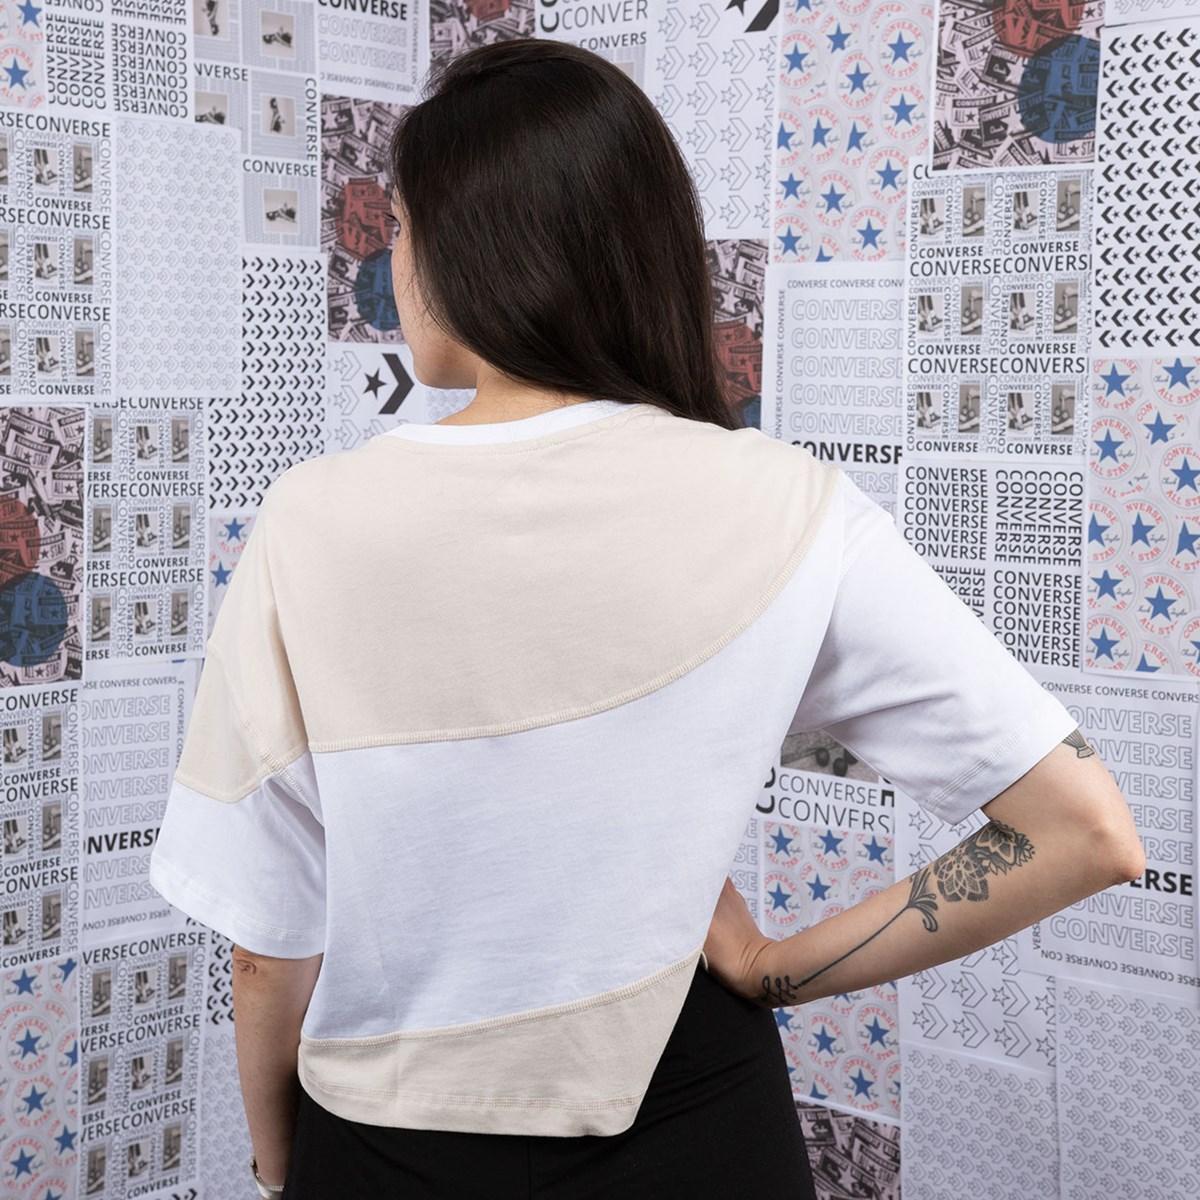 Camiseta Converse Cropped Rivalry Cut & Sew OS Brown Multi 10019793-A02